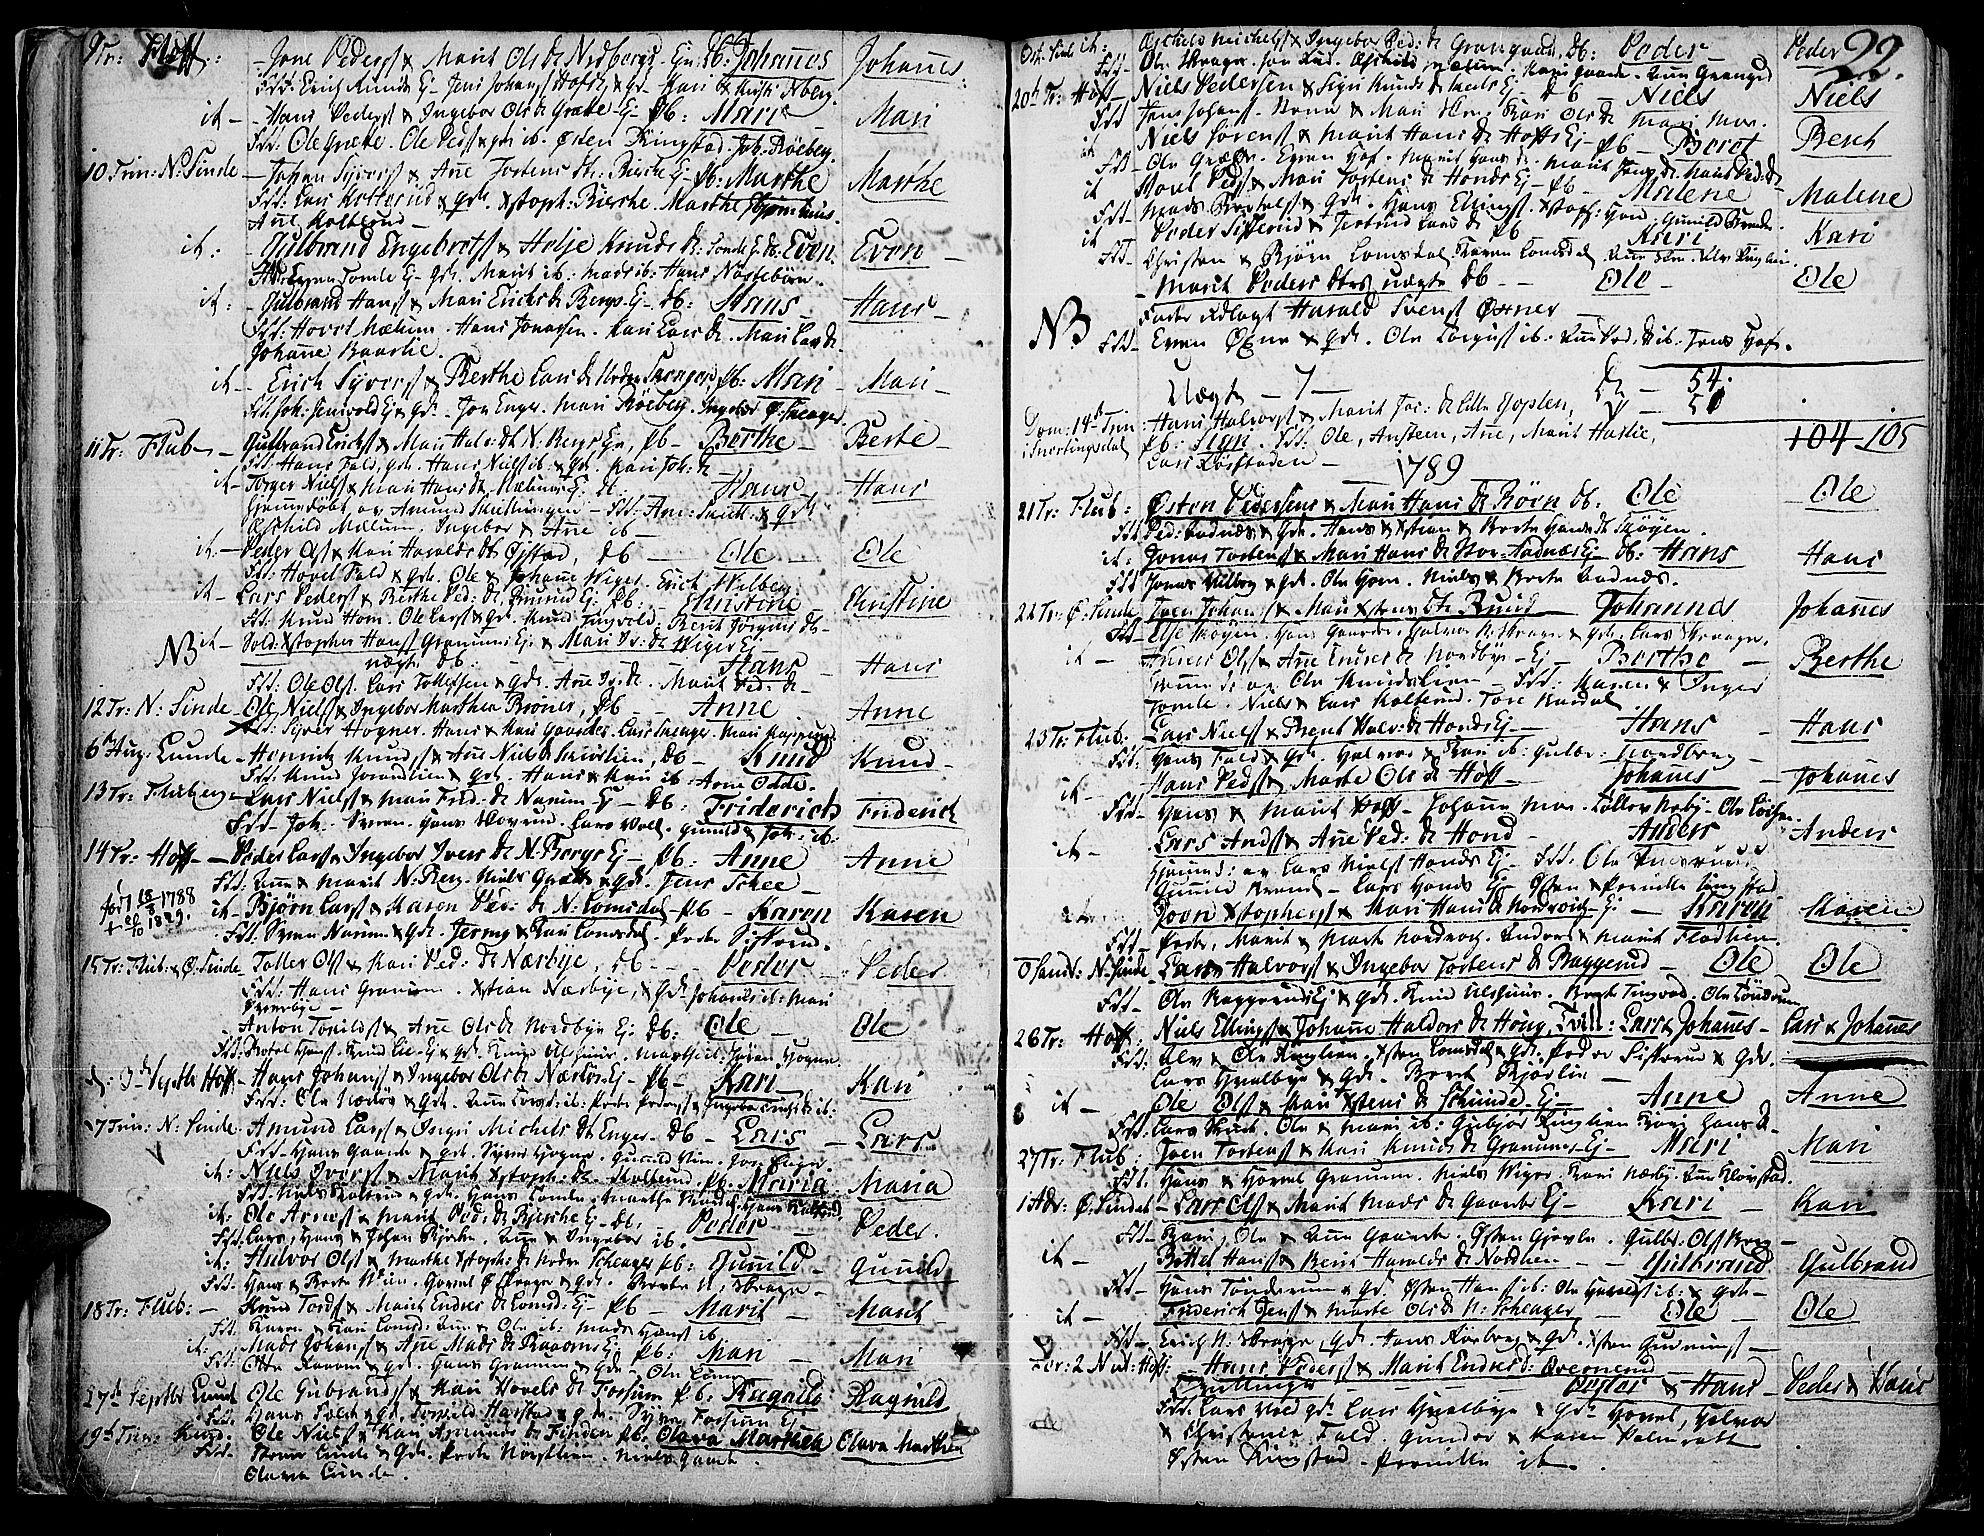 SAH, Land prestekontor, Ministerialbok nr. 6, 1784-1813, s. 22